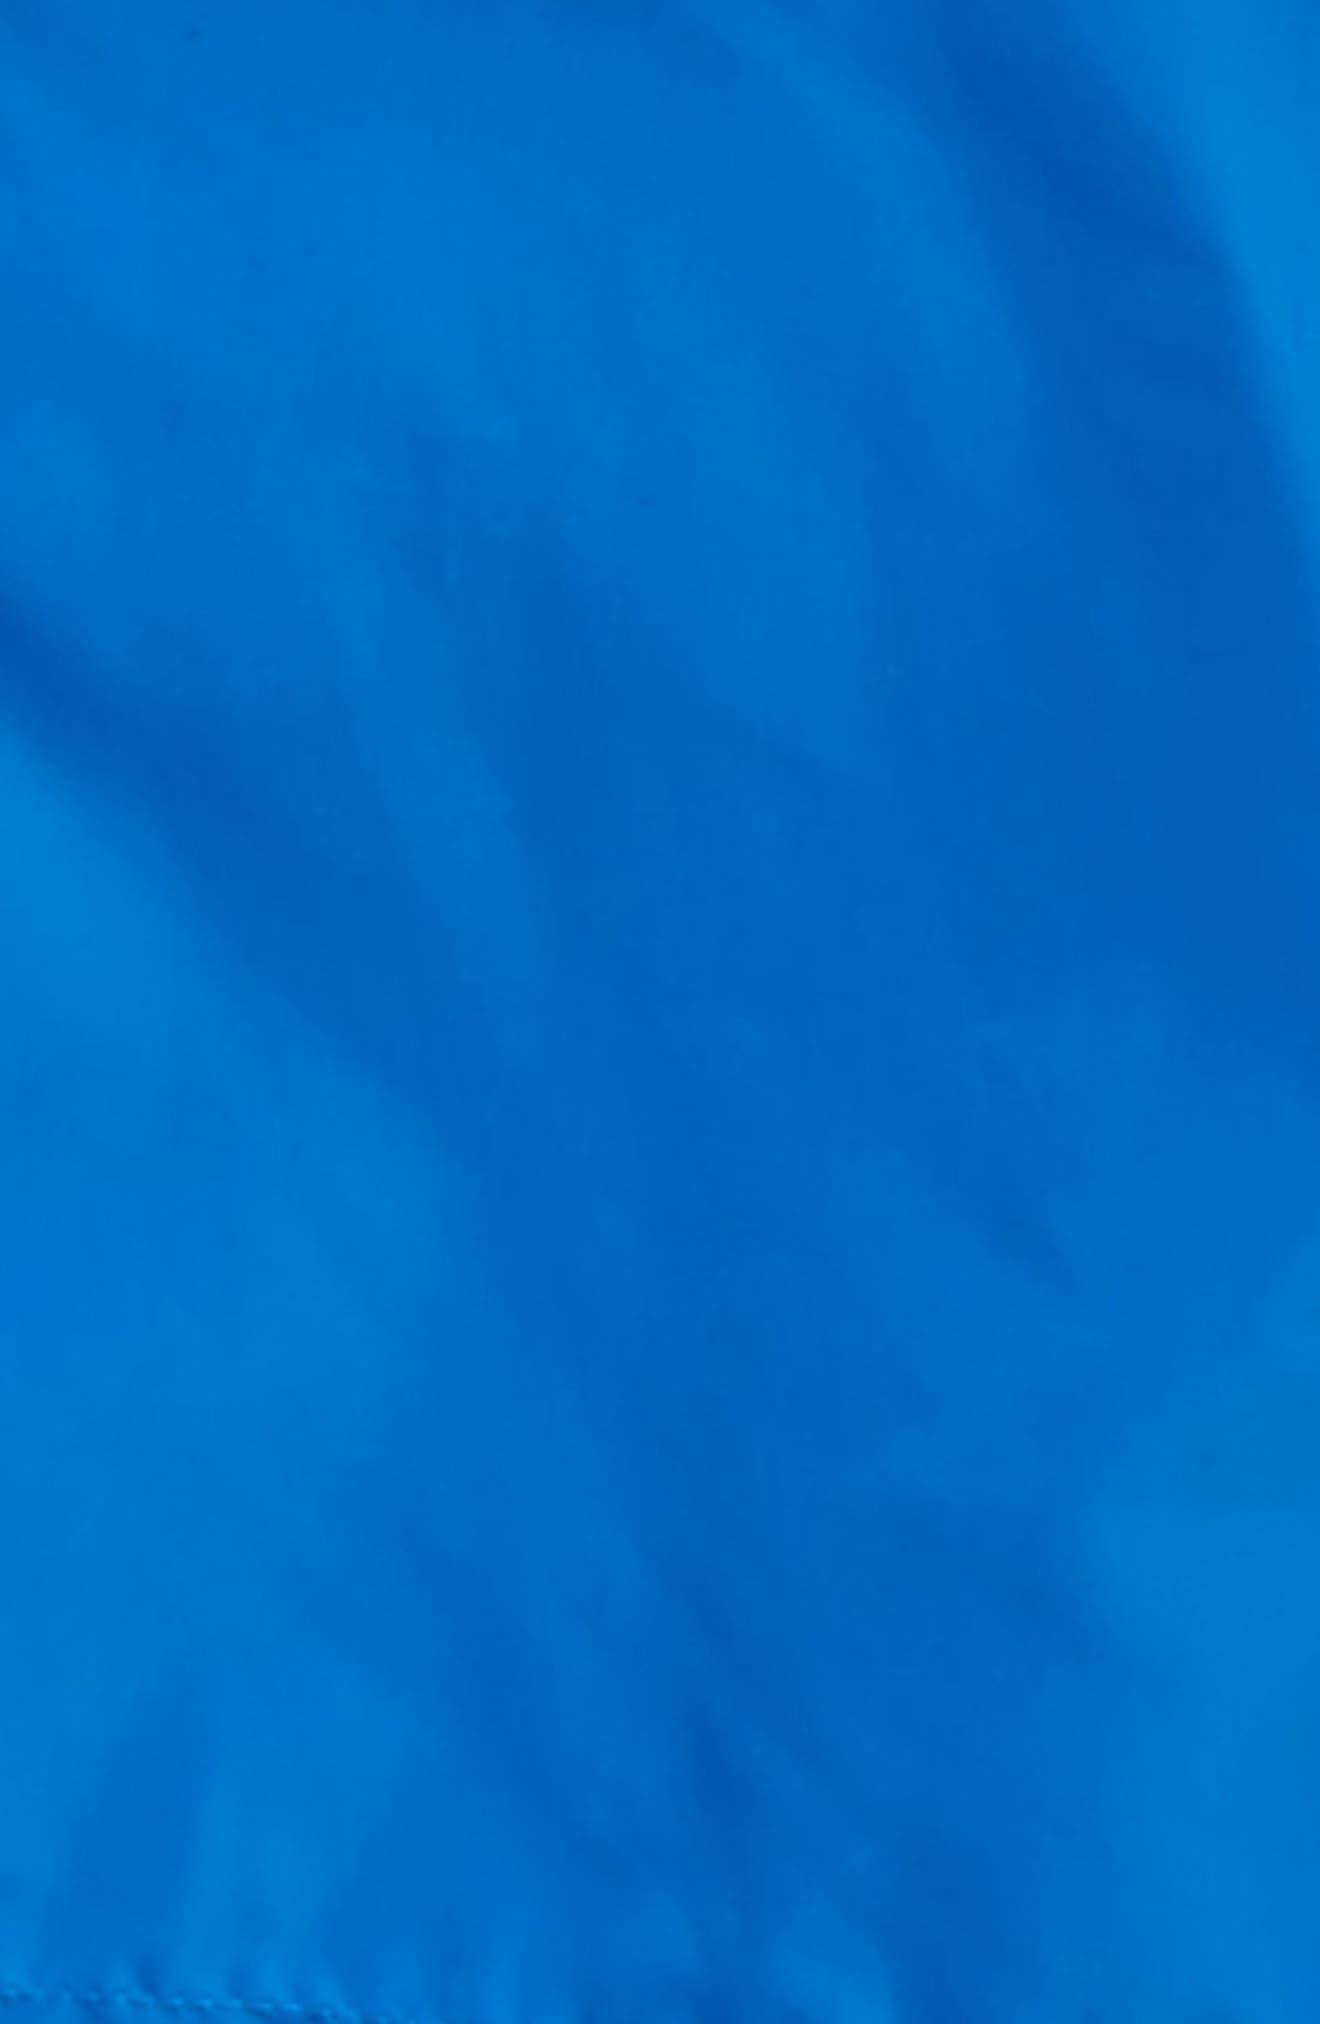 Yately Waterproof Field Jacket,                             Alternate thumbnail 2, color,                             Azure Blue